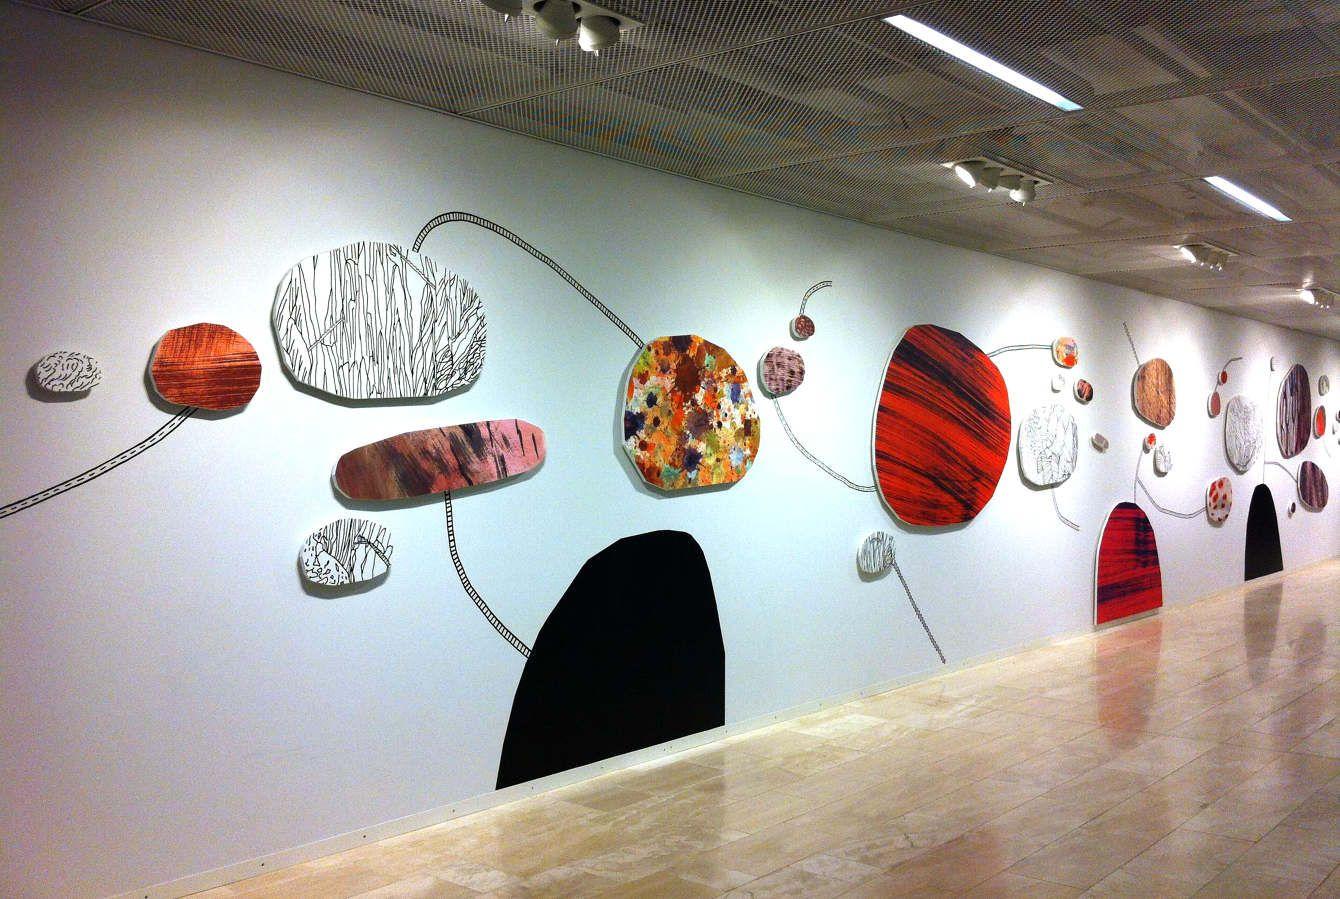 Small worlds - Jenni Rope -Permanent public artwork Kaisaniemi University Library Helsinki, Finland 2012